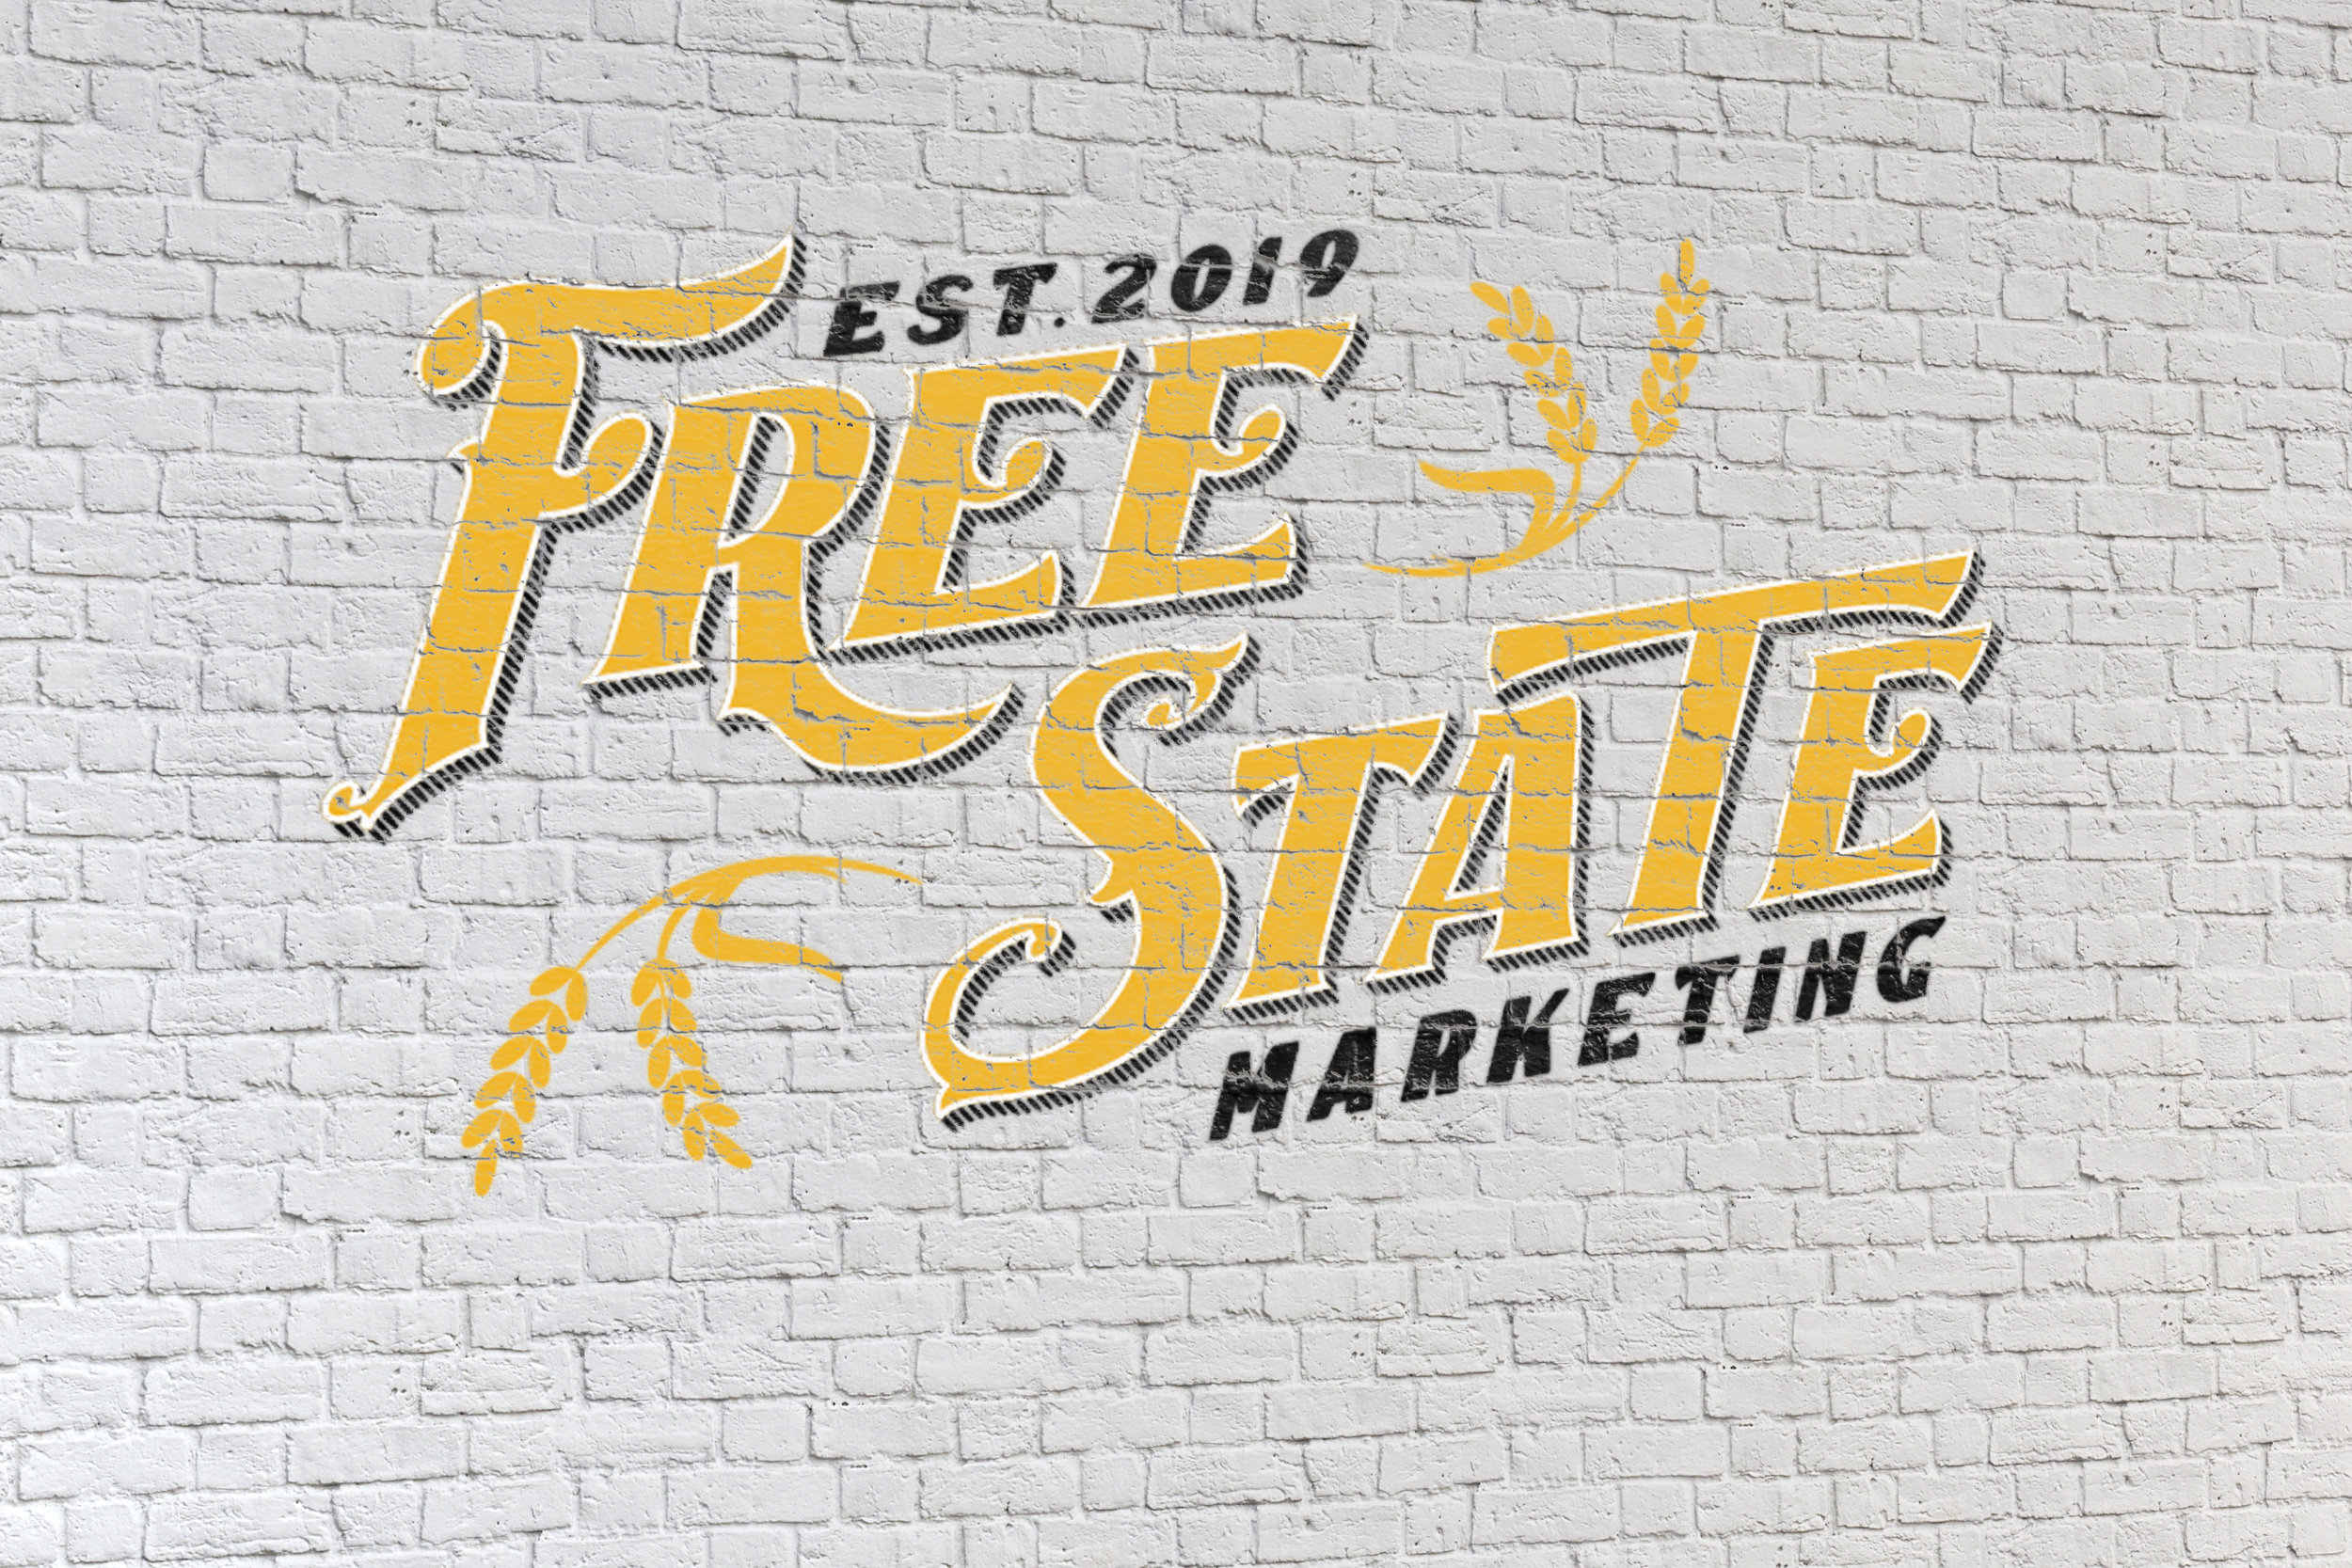 Free State Marketing Brick Wall.jpg